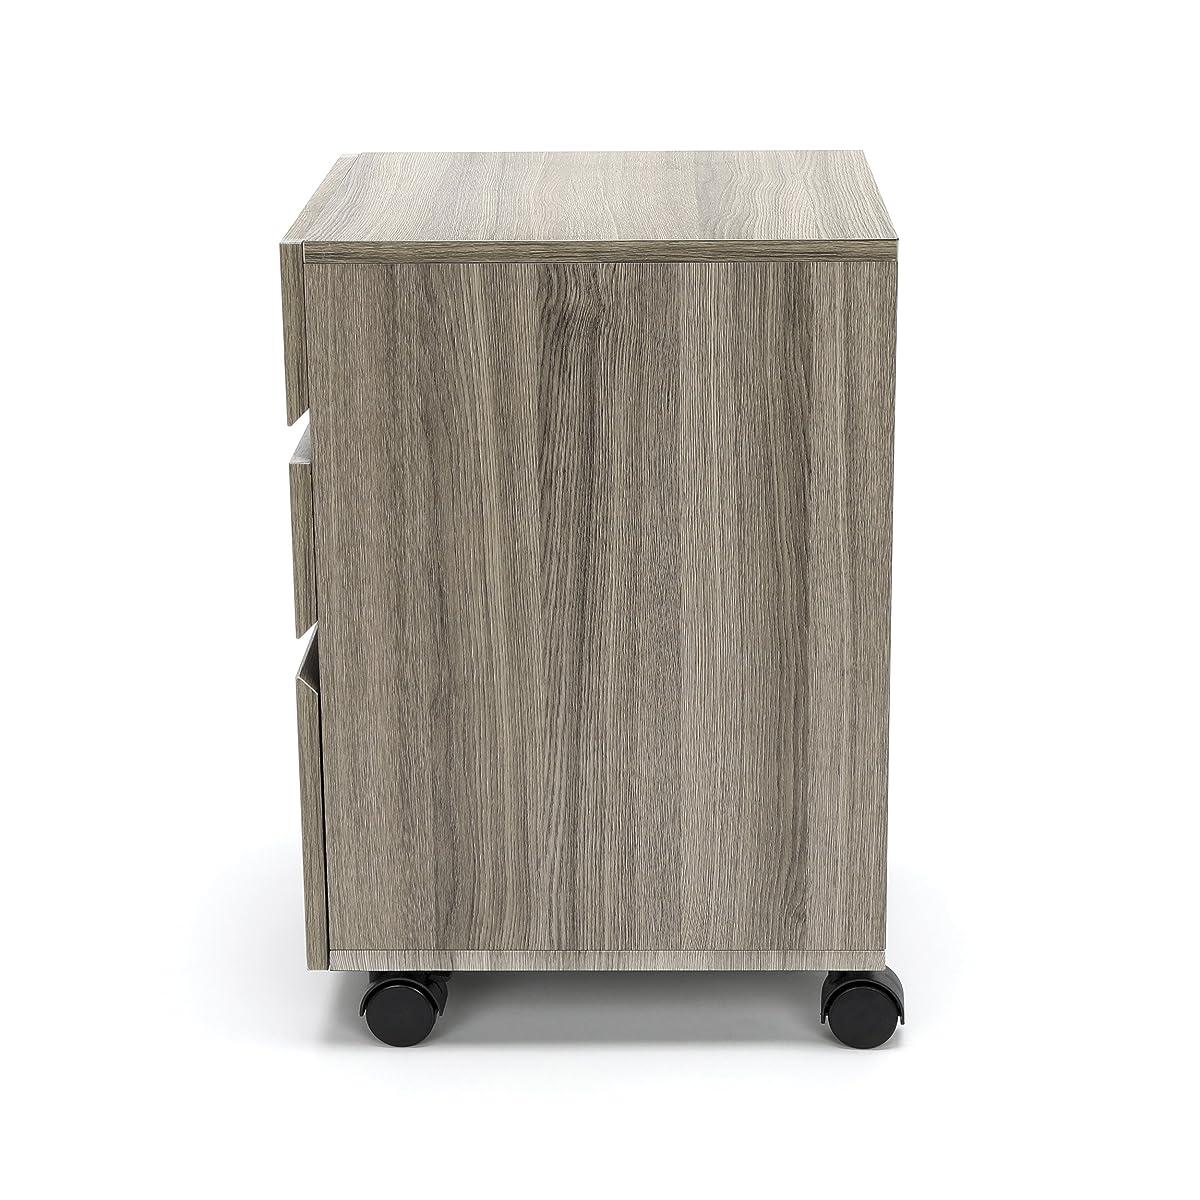 Essentials File Cabinet - 3-Drawer Wheeled Mobile Pedestal Cabinet, Driftwood (ESS-1030-DWD)